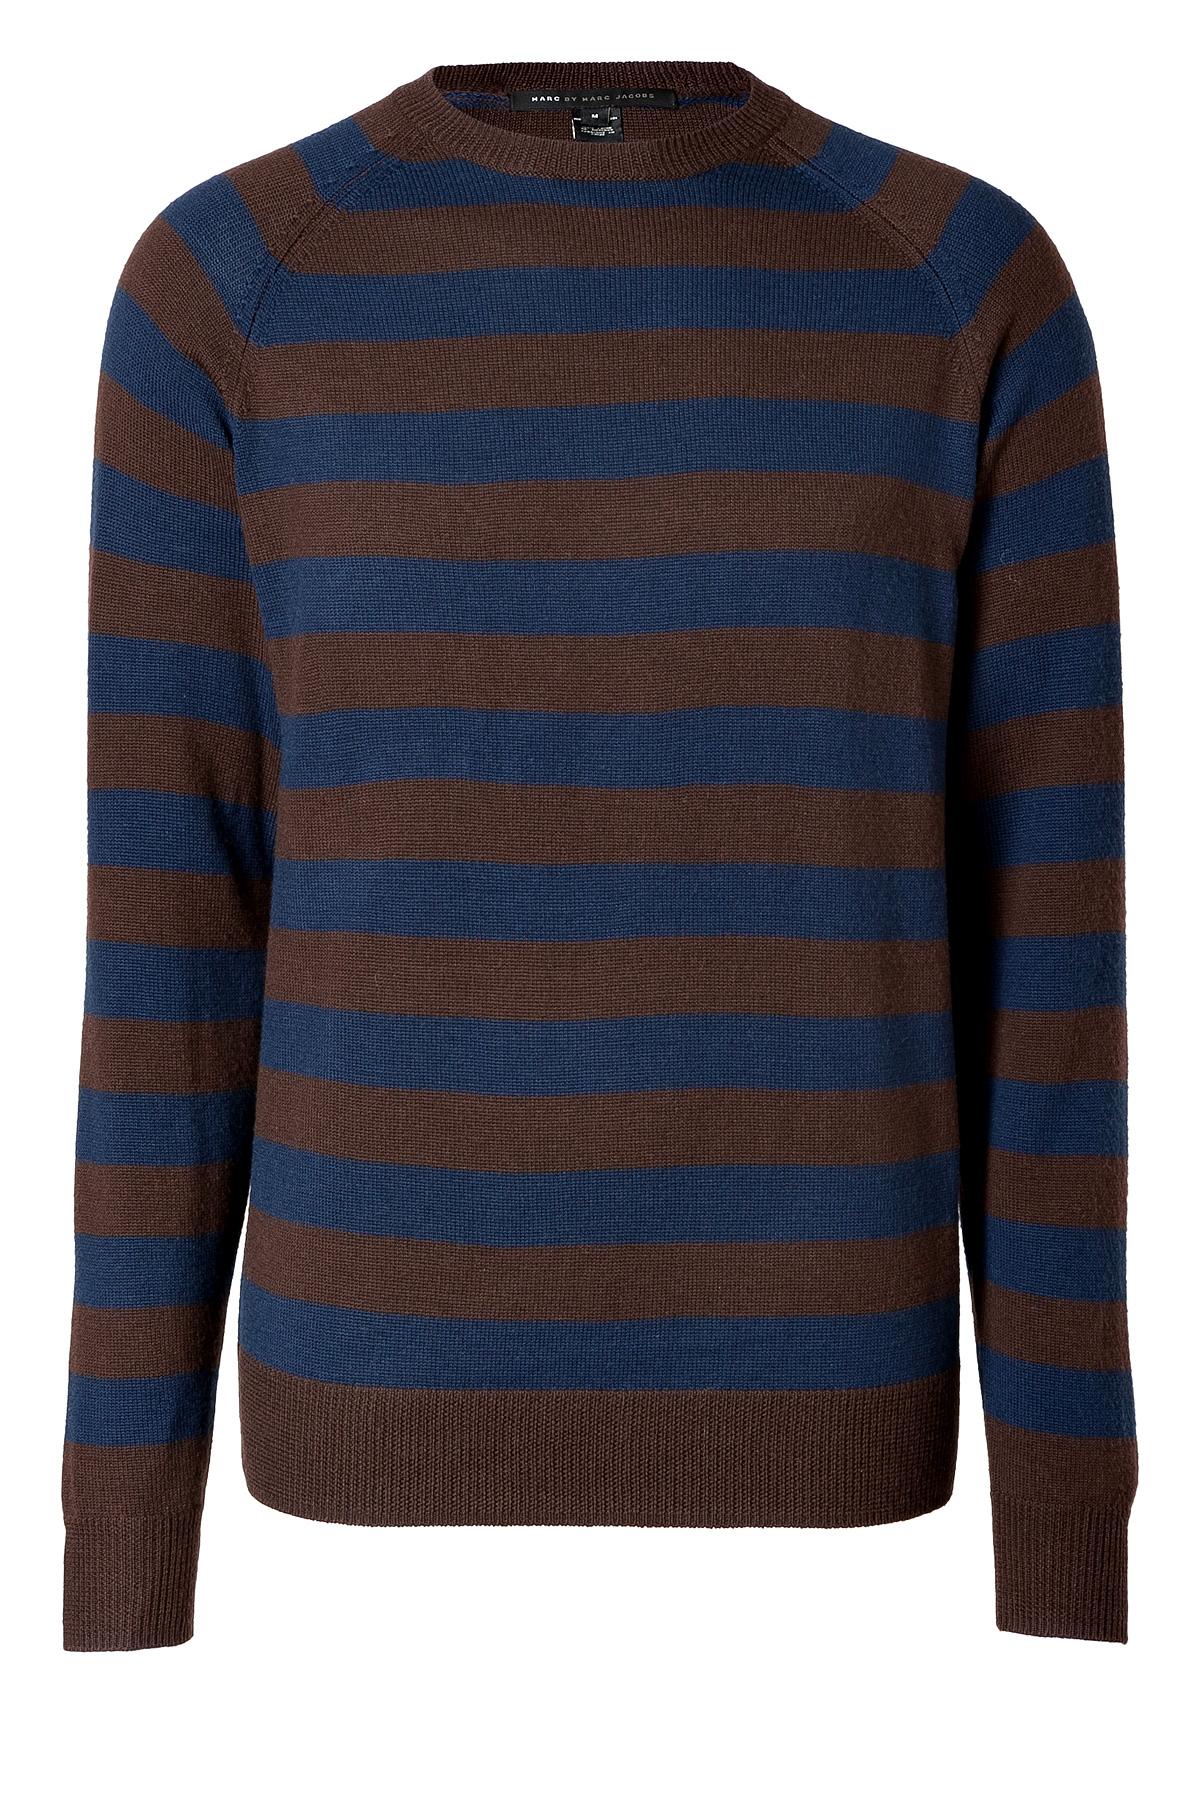 lyst marc by marc jacobs wool stripe pullover in darkest brown multi in brown for men. Black Bedroom Furniture Sets. Home Design Ideas